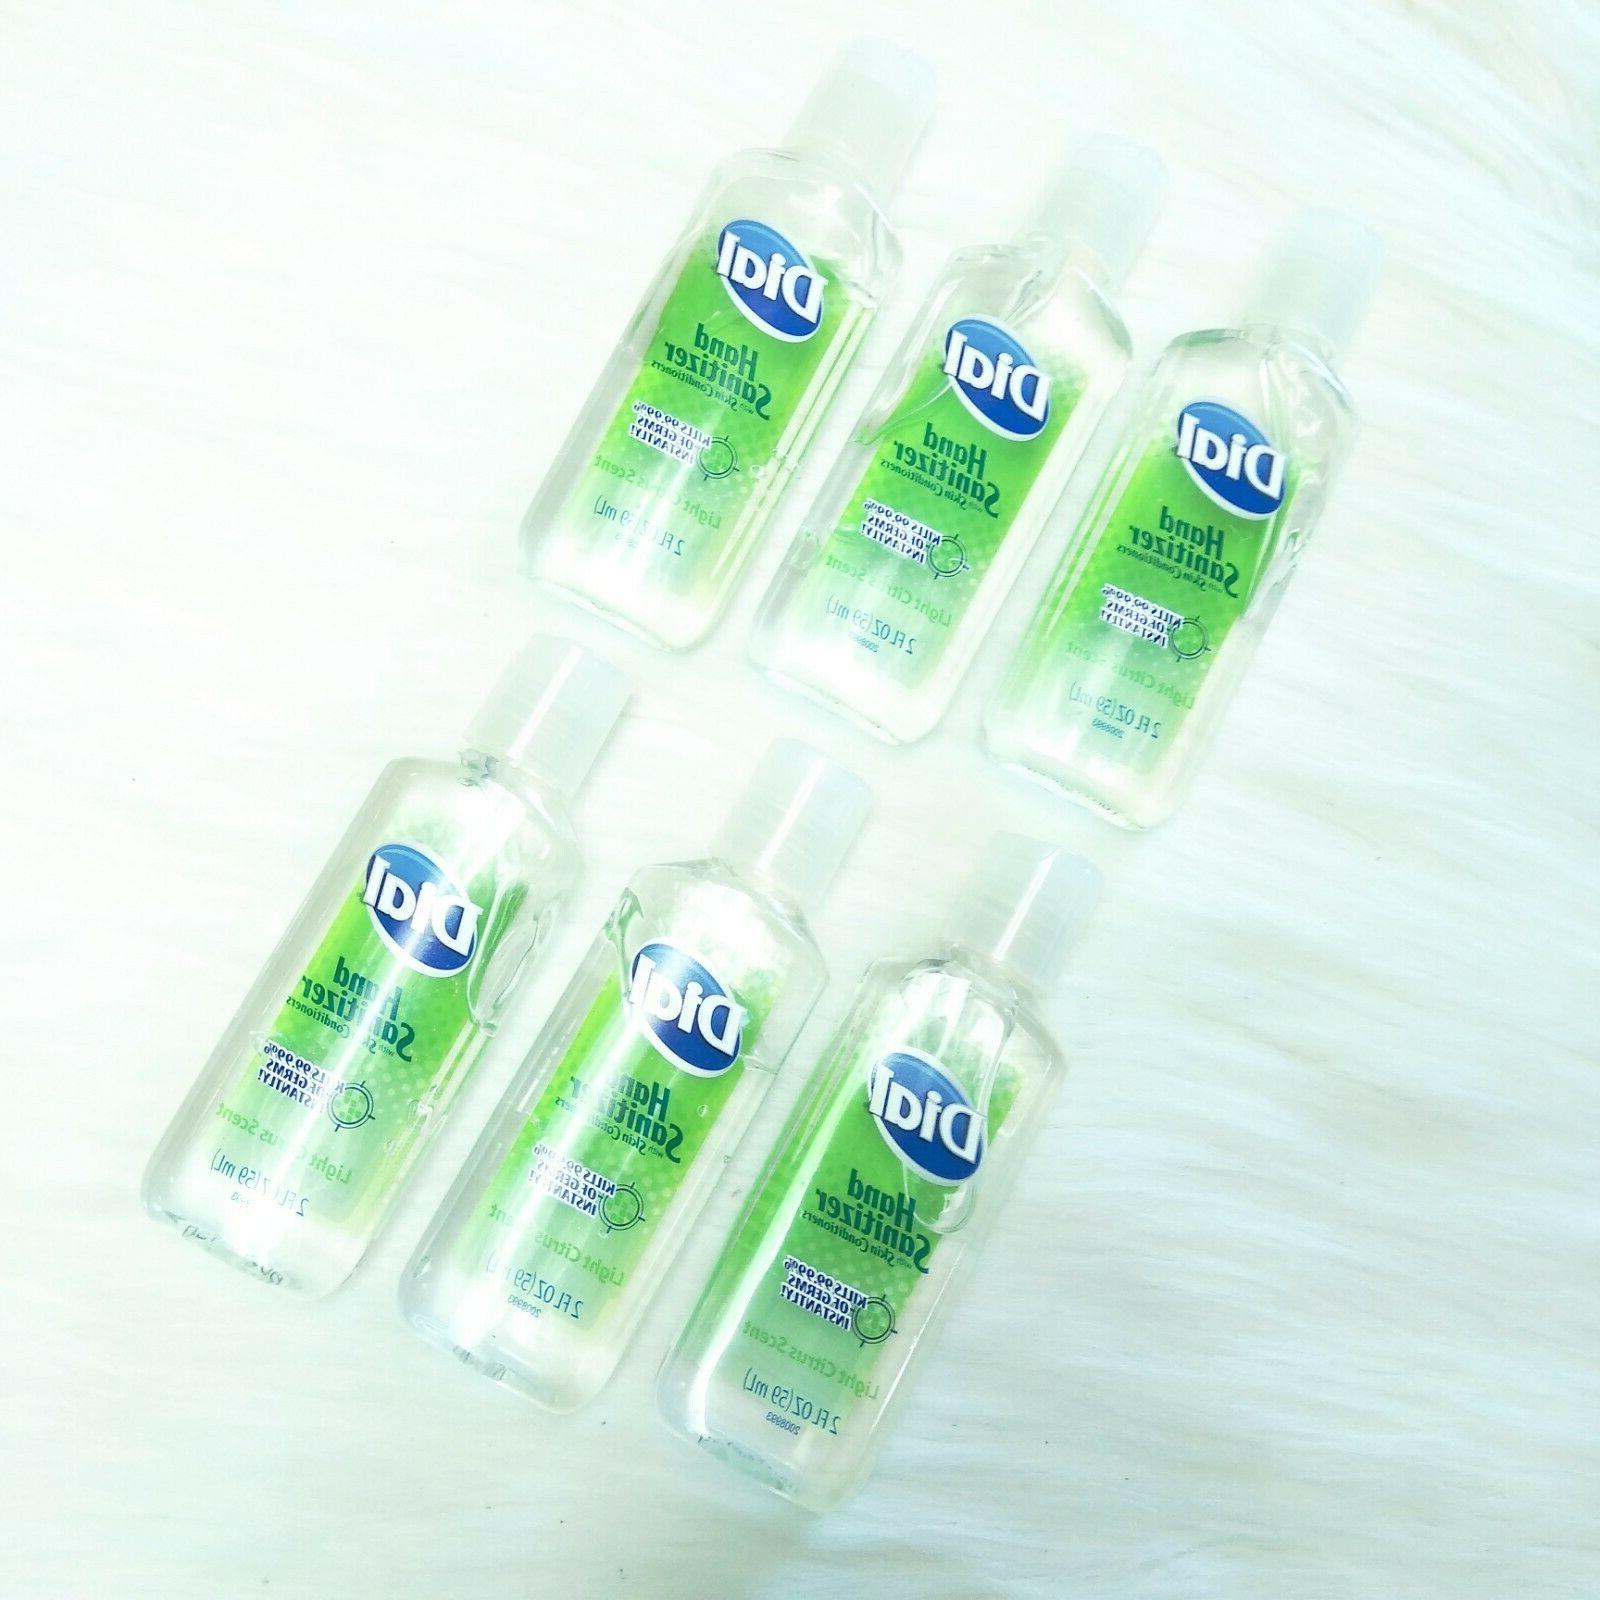 6 antibacterial hand sanitizer w skin conditioner